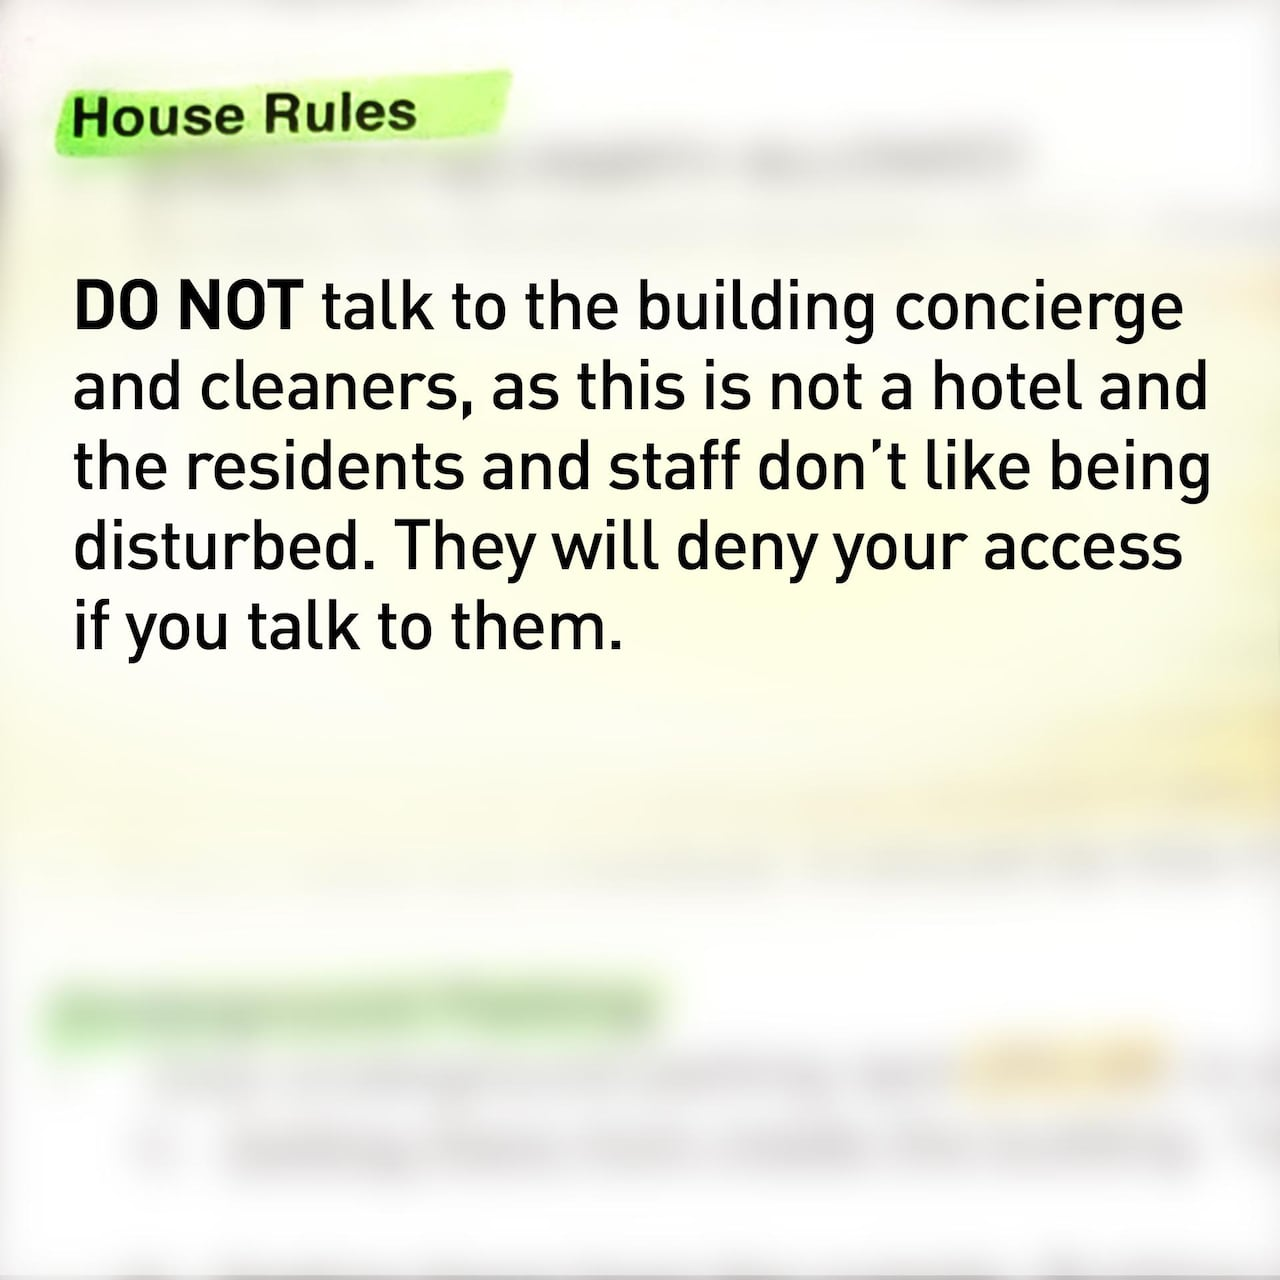 I felt like a criminal': Airbnb hosts ask guests to lie, sneak